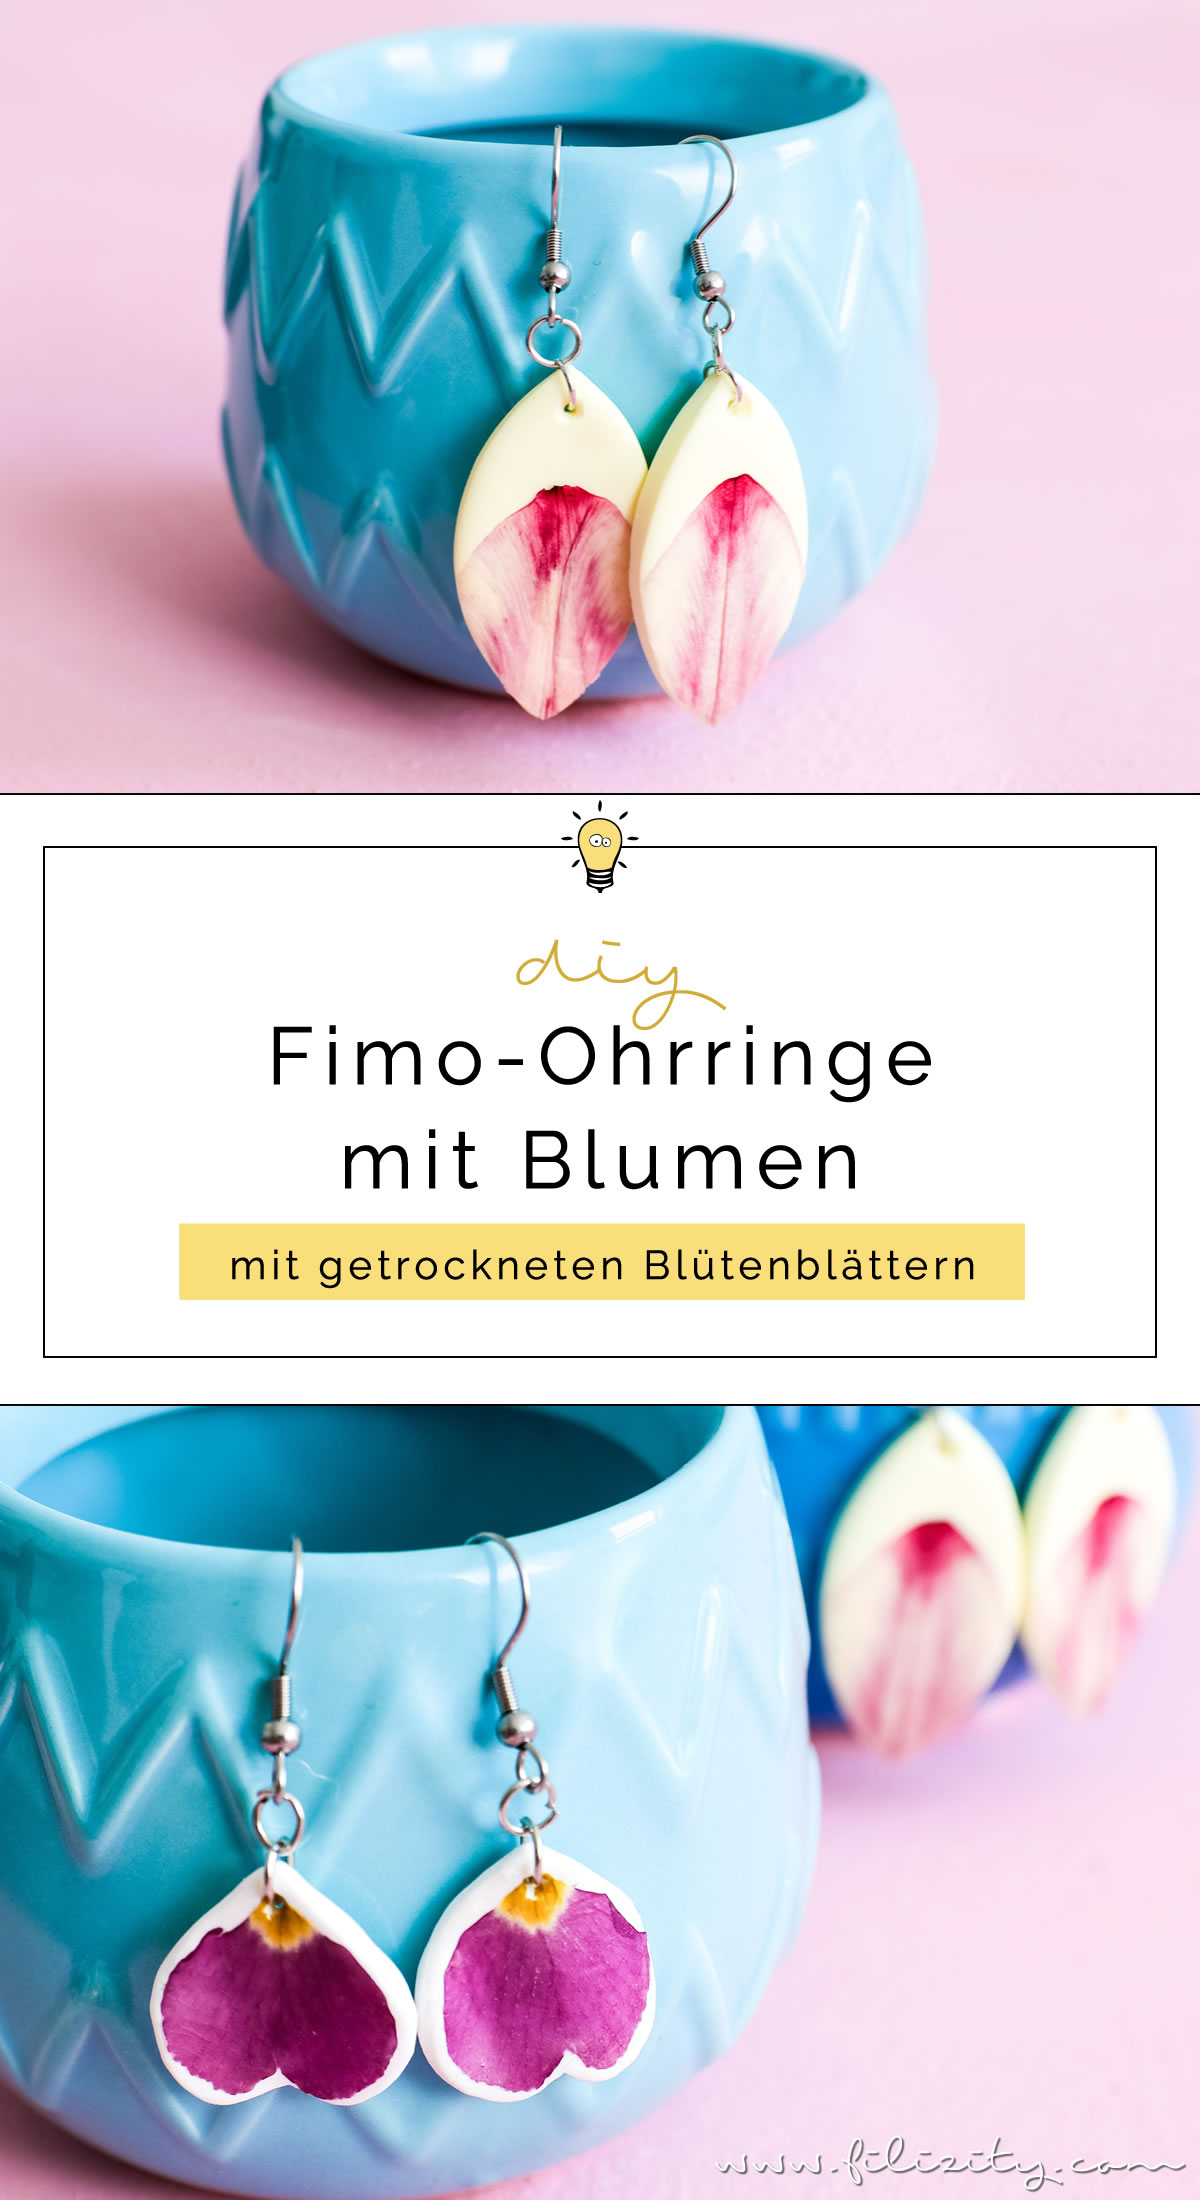 DIY Fashion: Fimo-Ohrringe mit getrockneten Blumen selber machen | Filizity.com | DIY-Blog aus dem Rheinland #myFimo #fimo